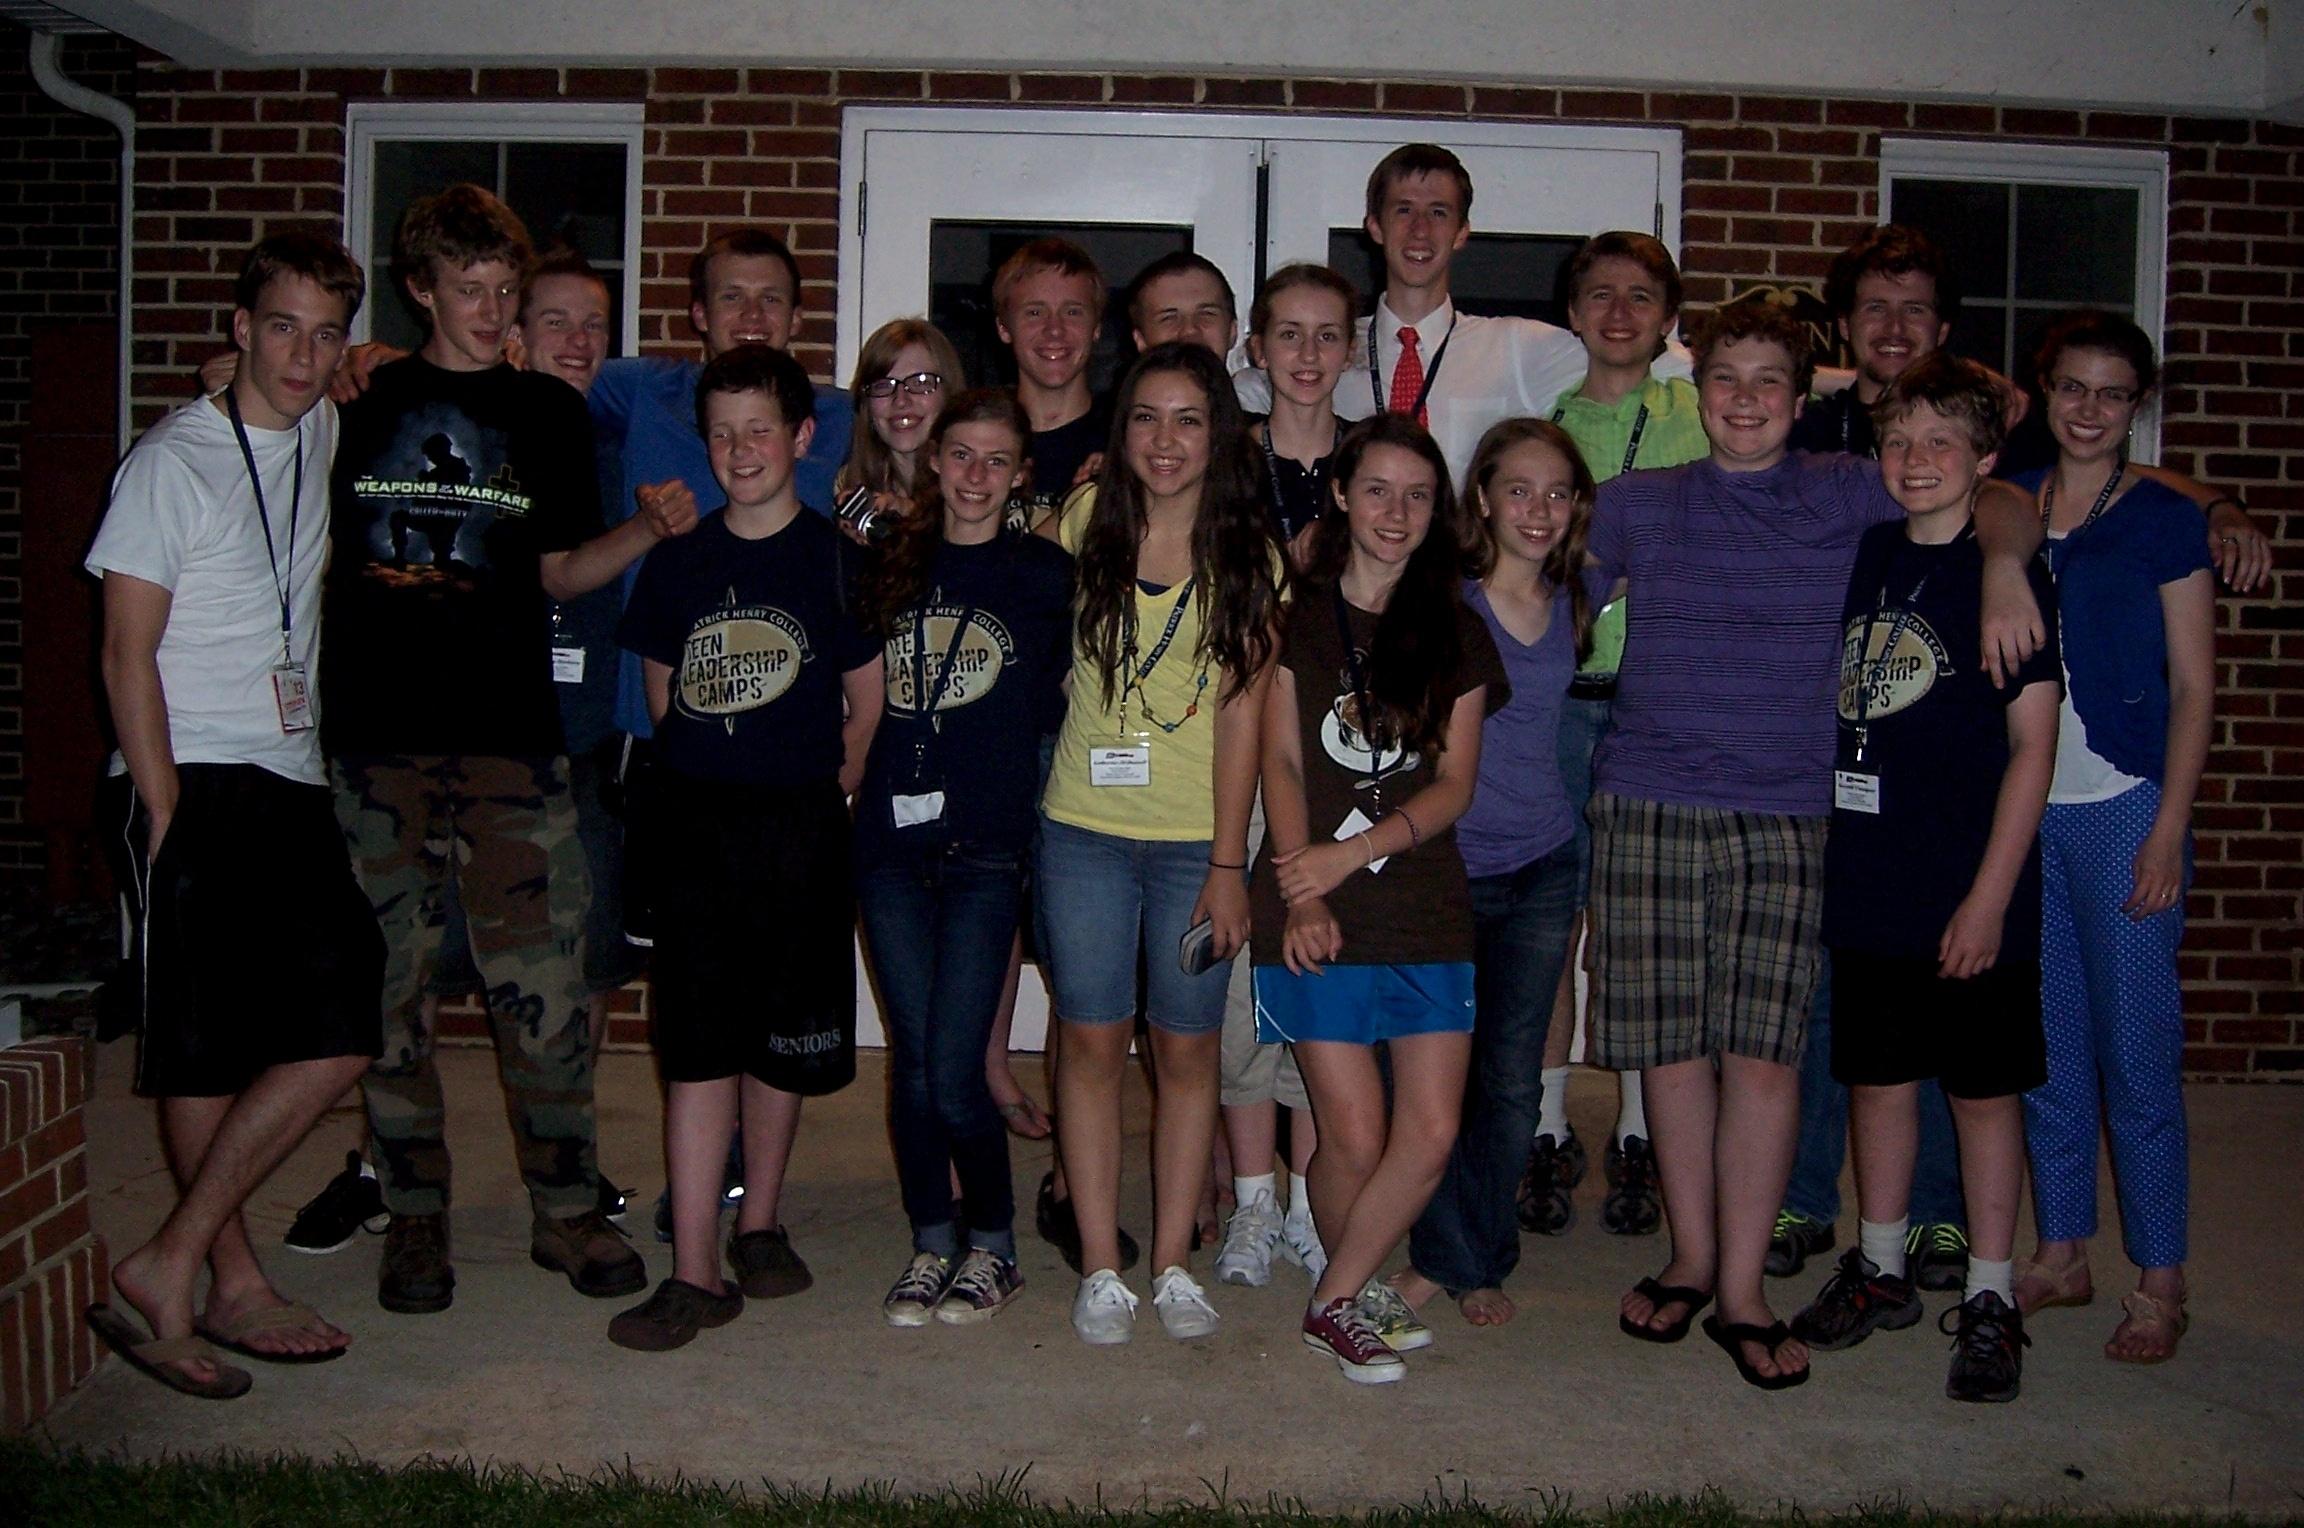 Patrick Henry College (PHC) Strategic Intelligence (SI) Teen Camp 2013